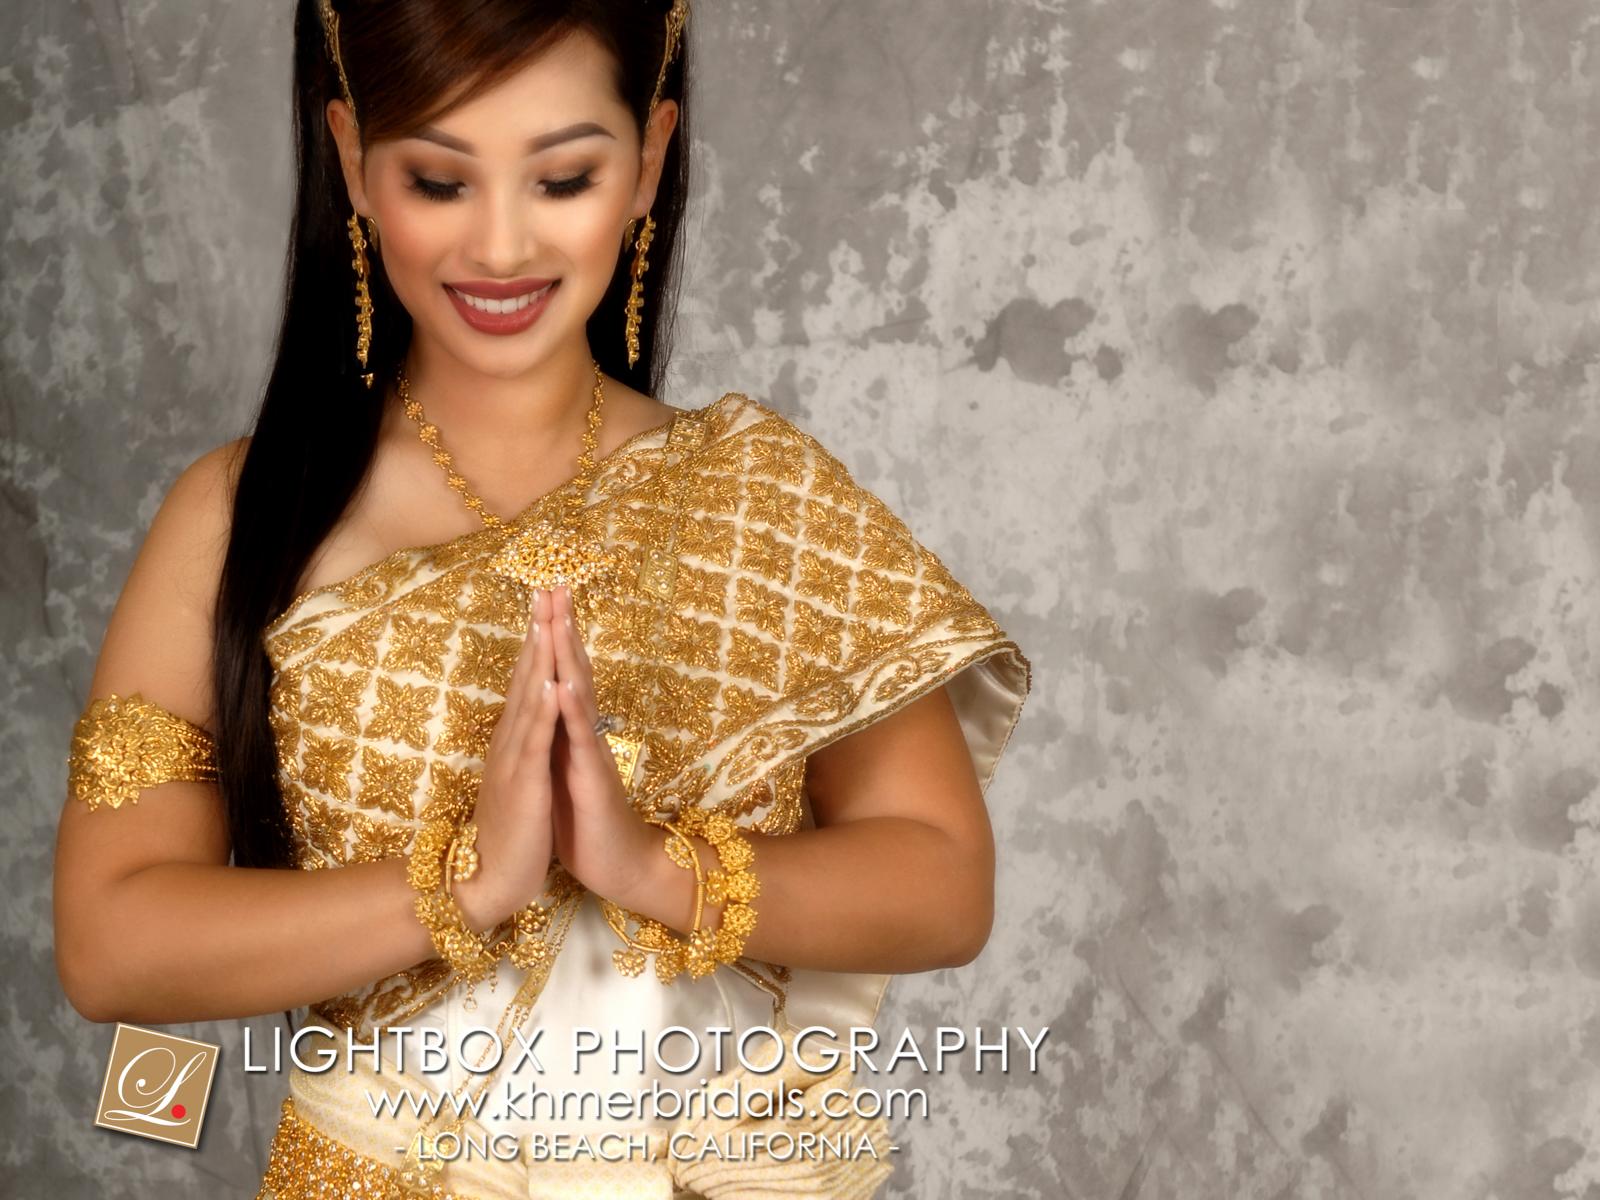 Apsara Khmer Bridal Wedding Photography and video-205.jpg